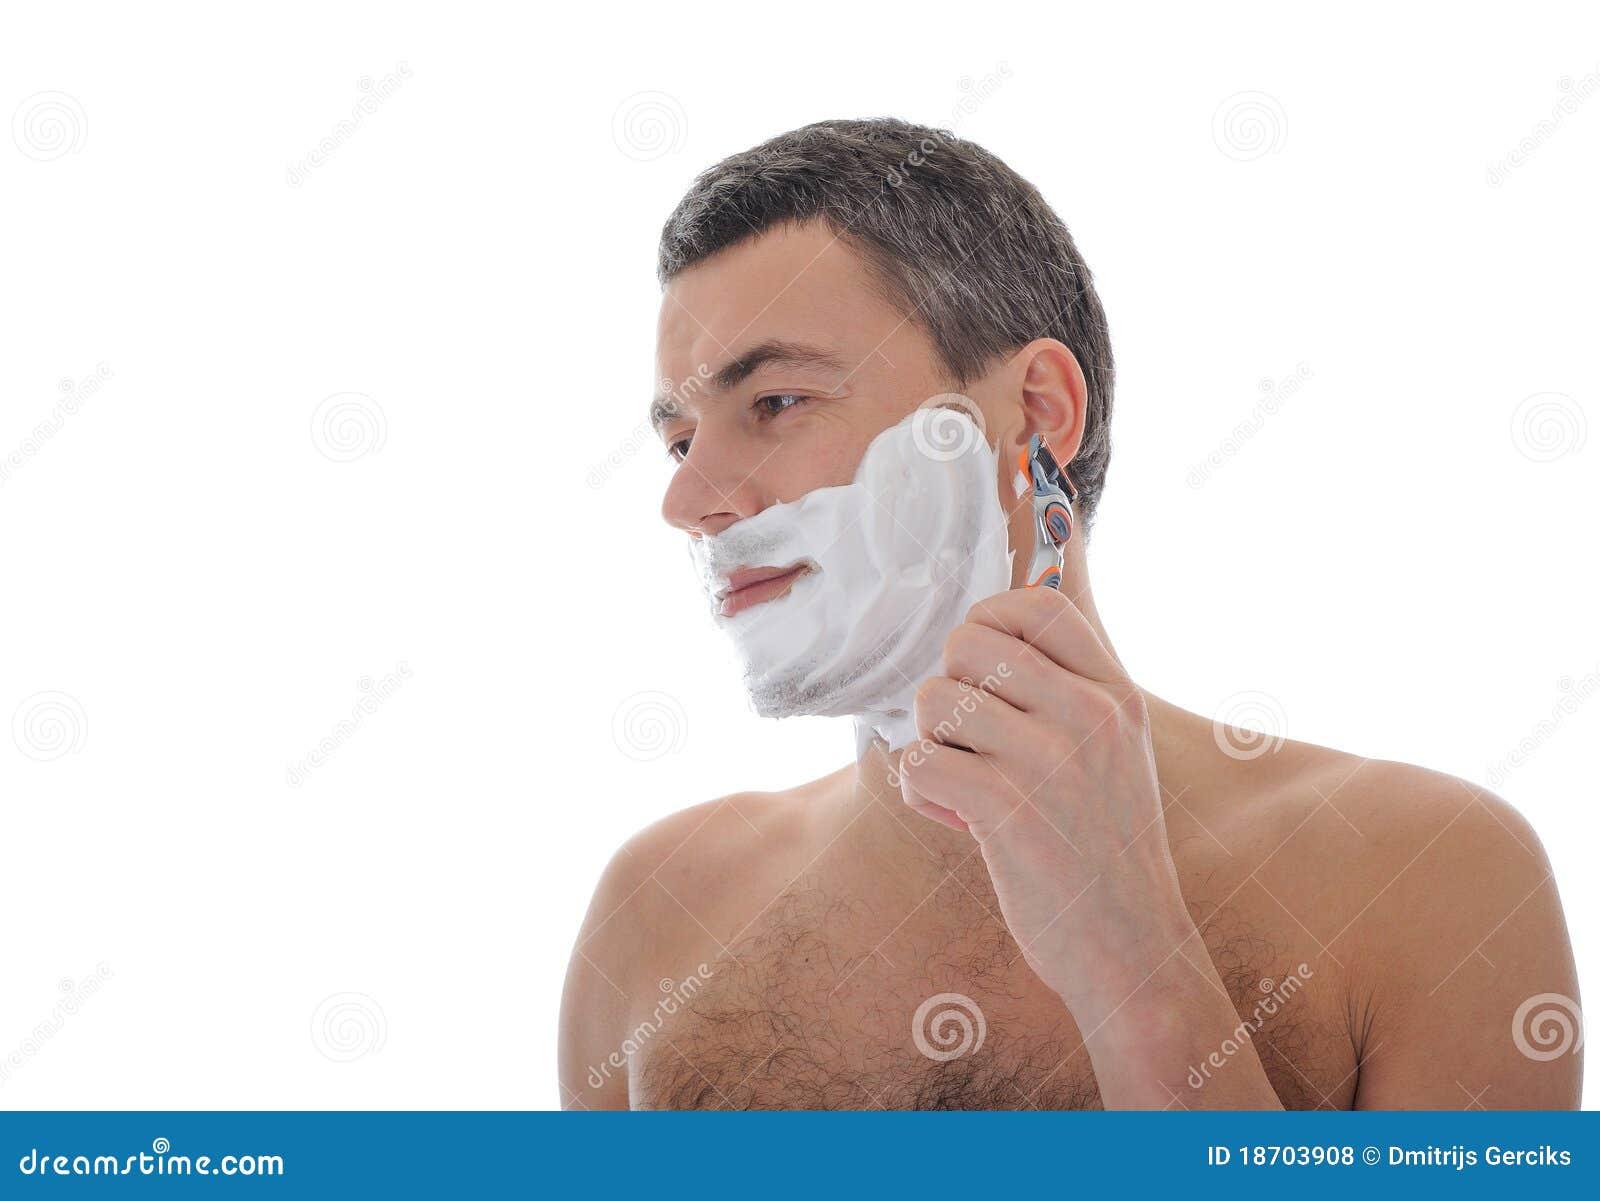 2 hot shower fuck